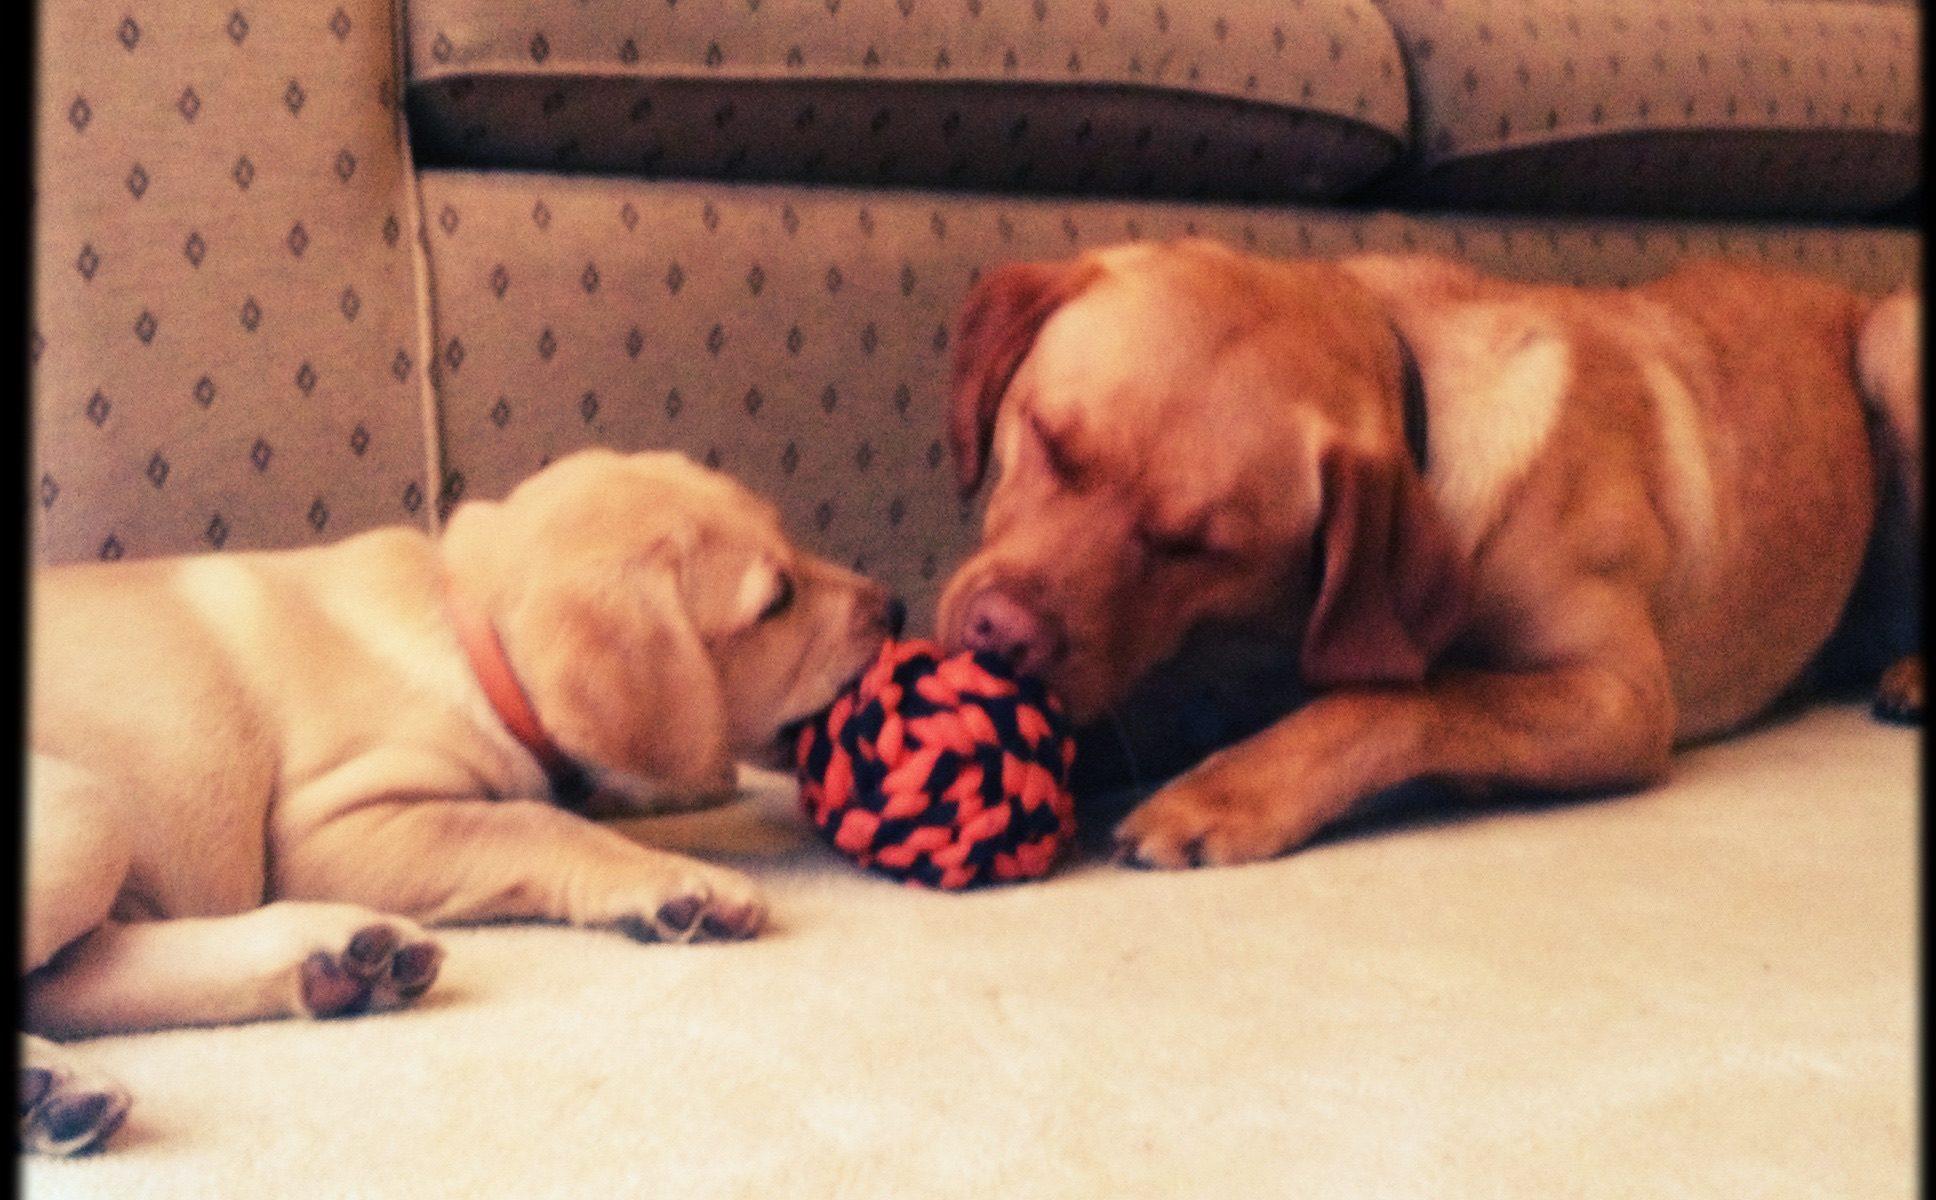 Labrador Puppies Playing